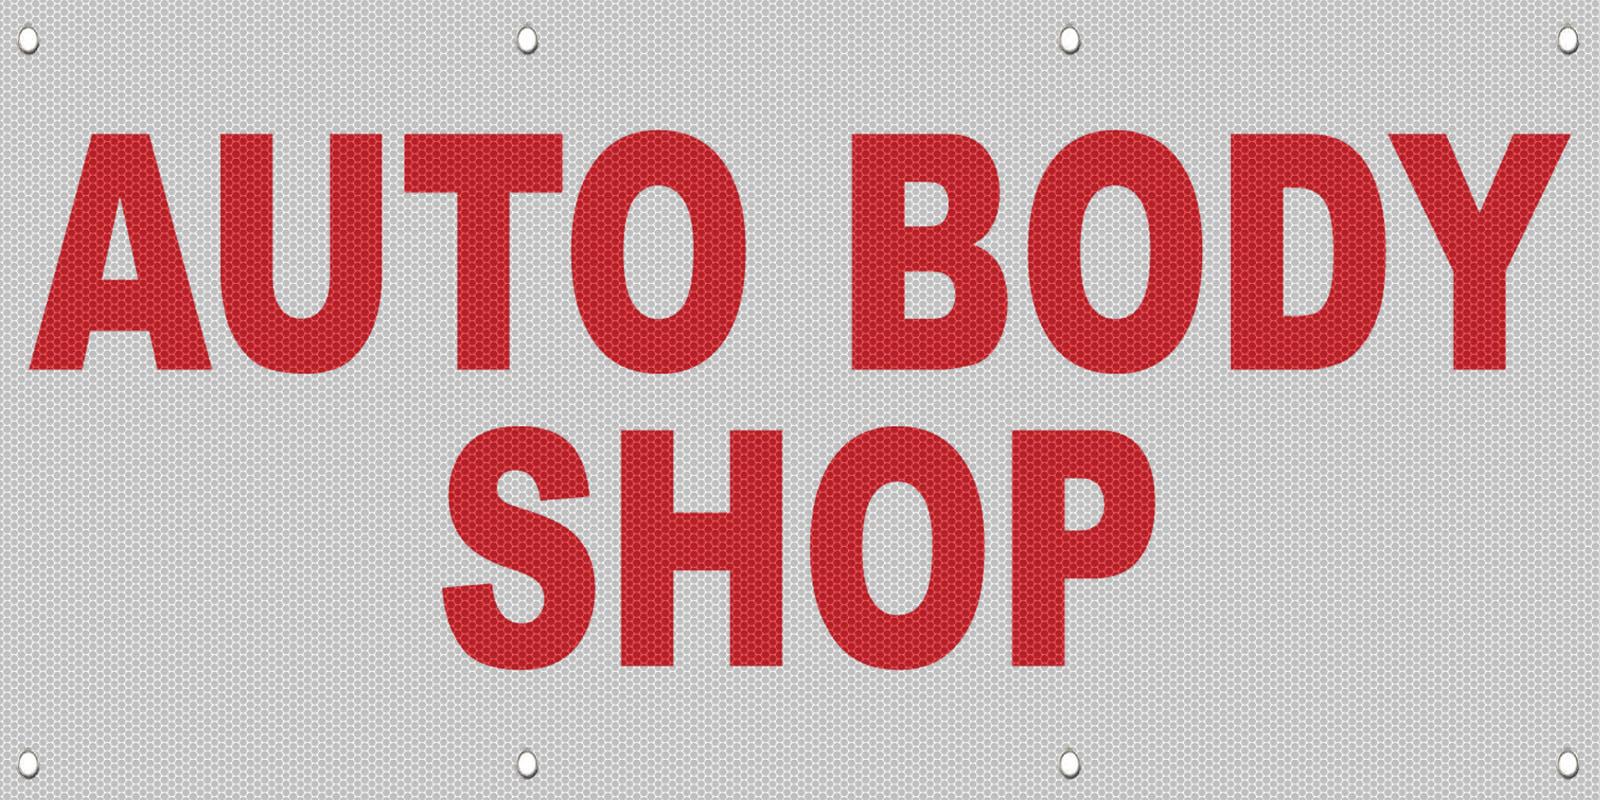 Auto Body Shop Red Auto Car Repair Shop Mesh Windproof